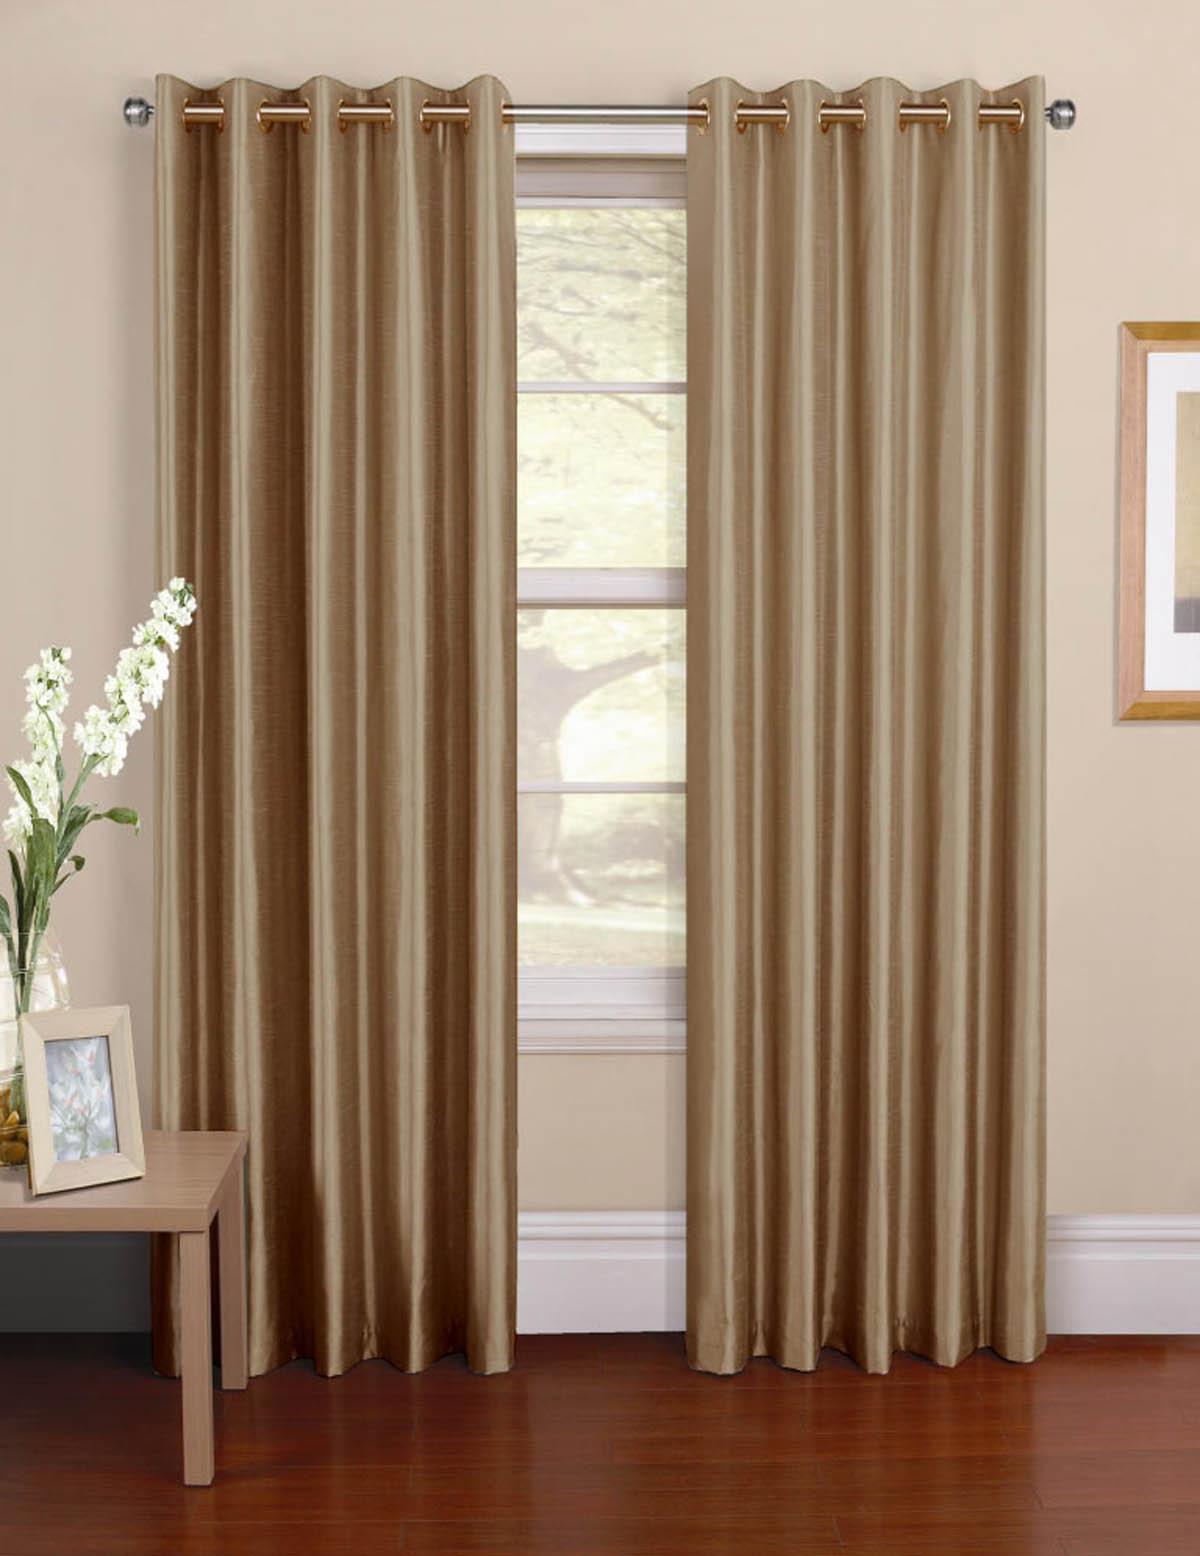 Purple silk curtains - Venezia Ready Made Eyelet Curtains